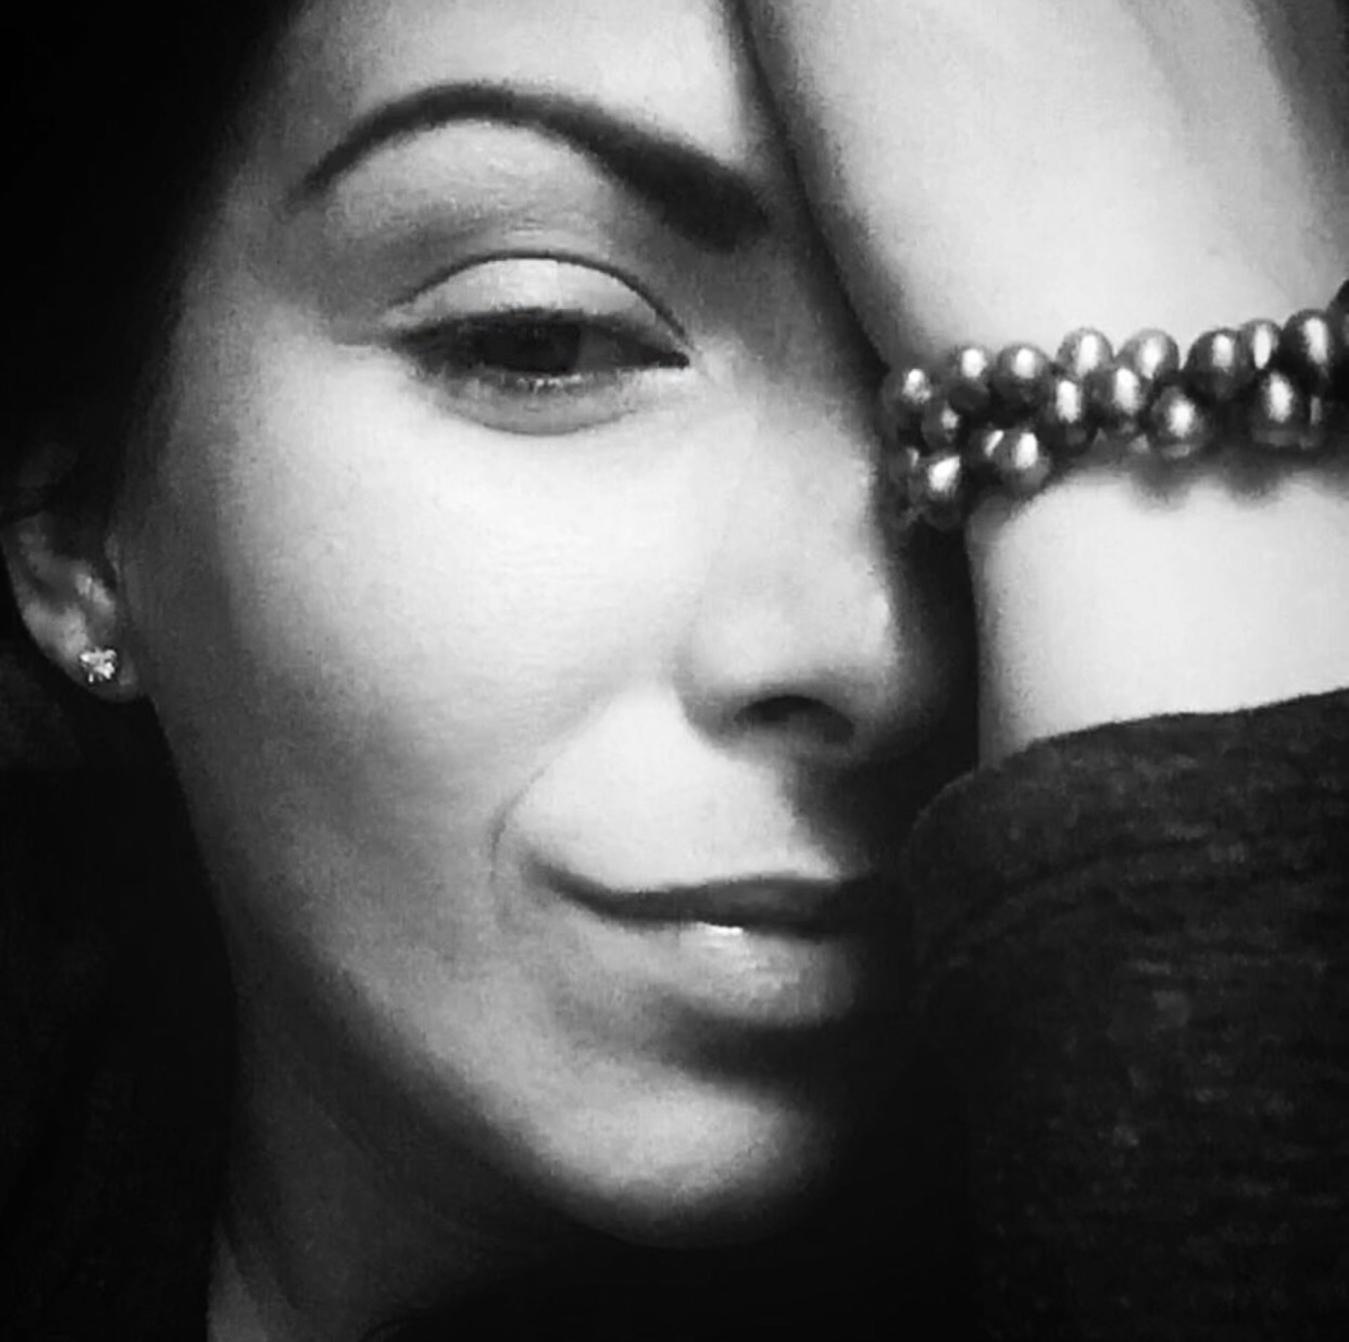 Katie_kerl_self_portraits_backlash_close-up_bracelet